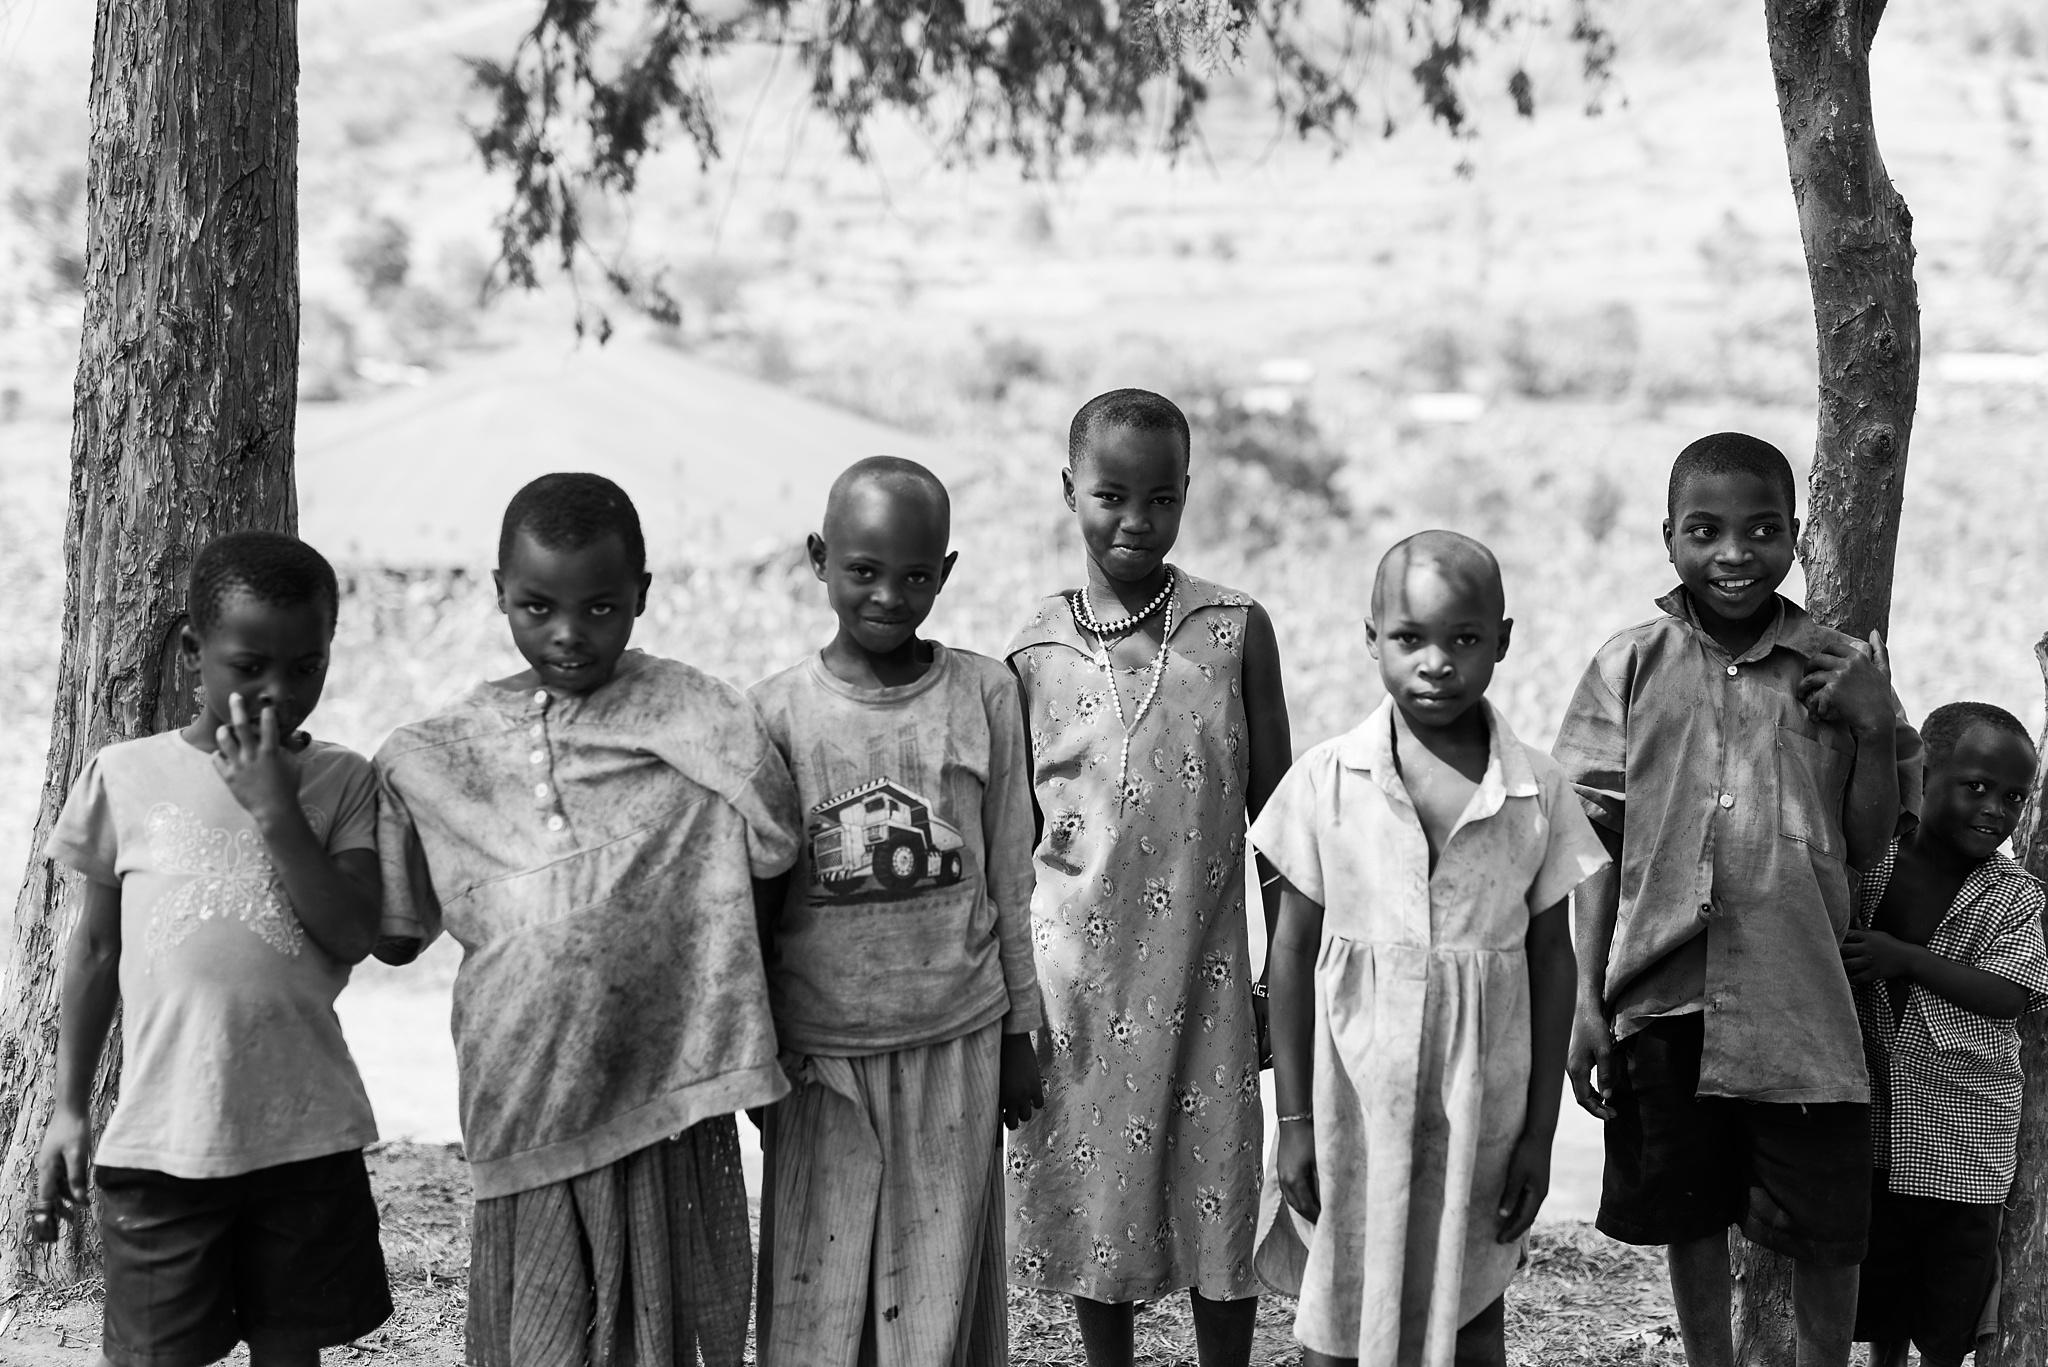 destination-photographer-uganda-graceforeducation-117.jpg